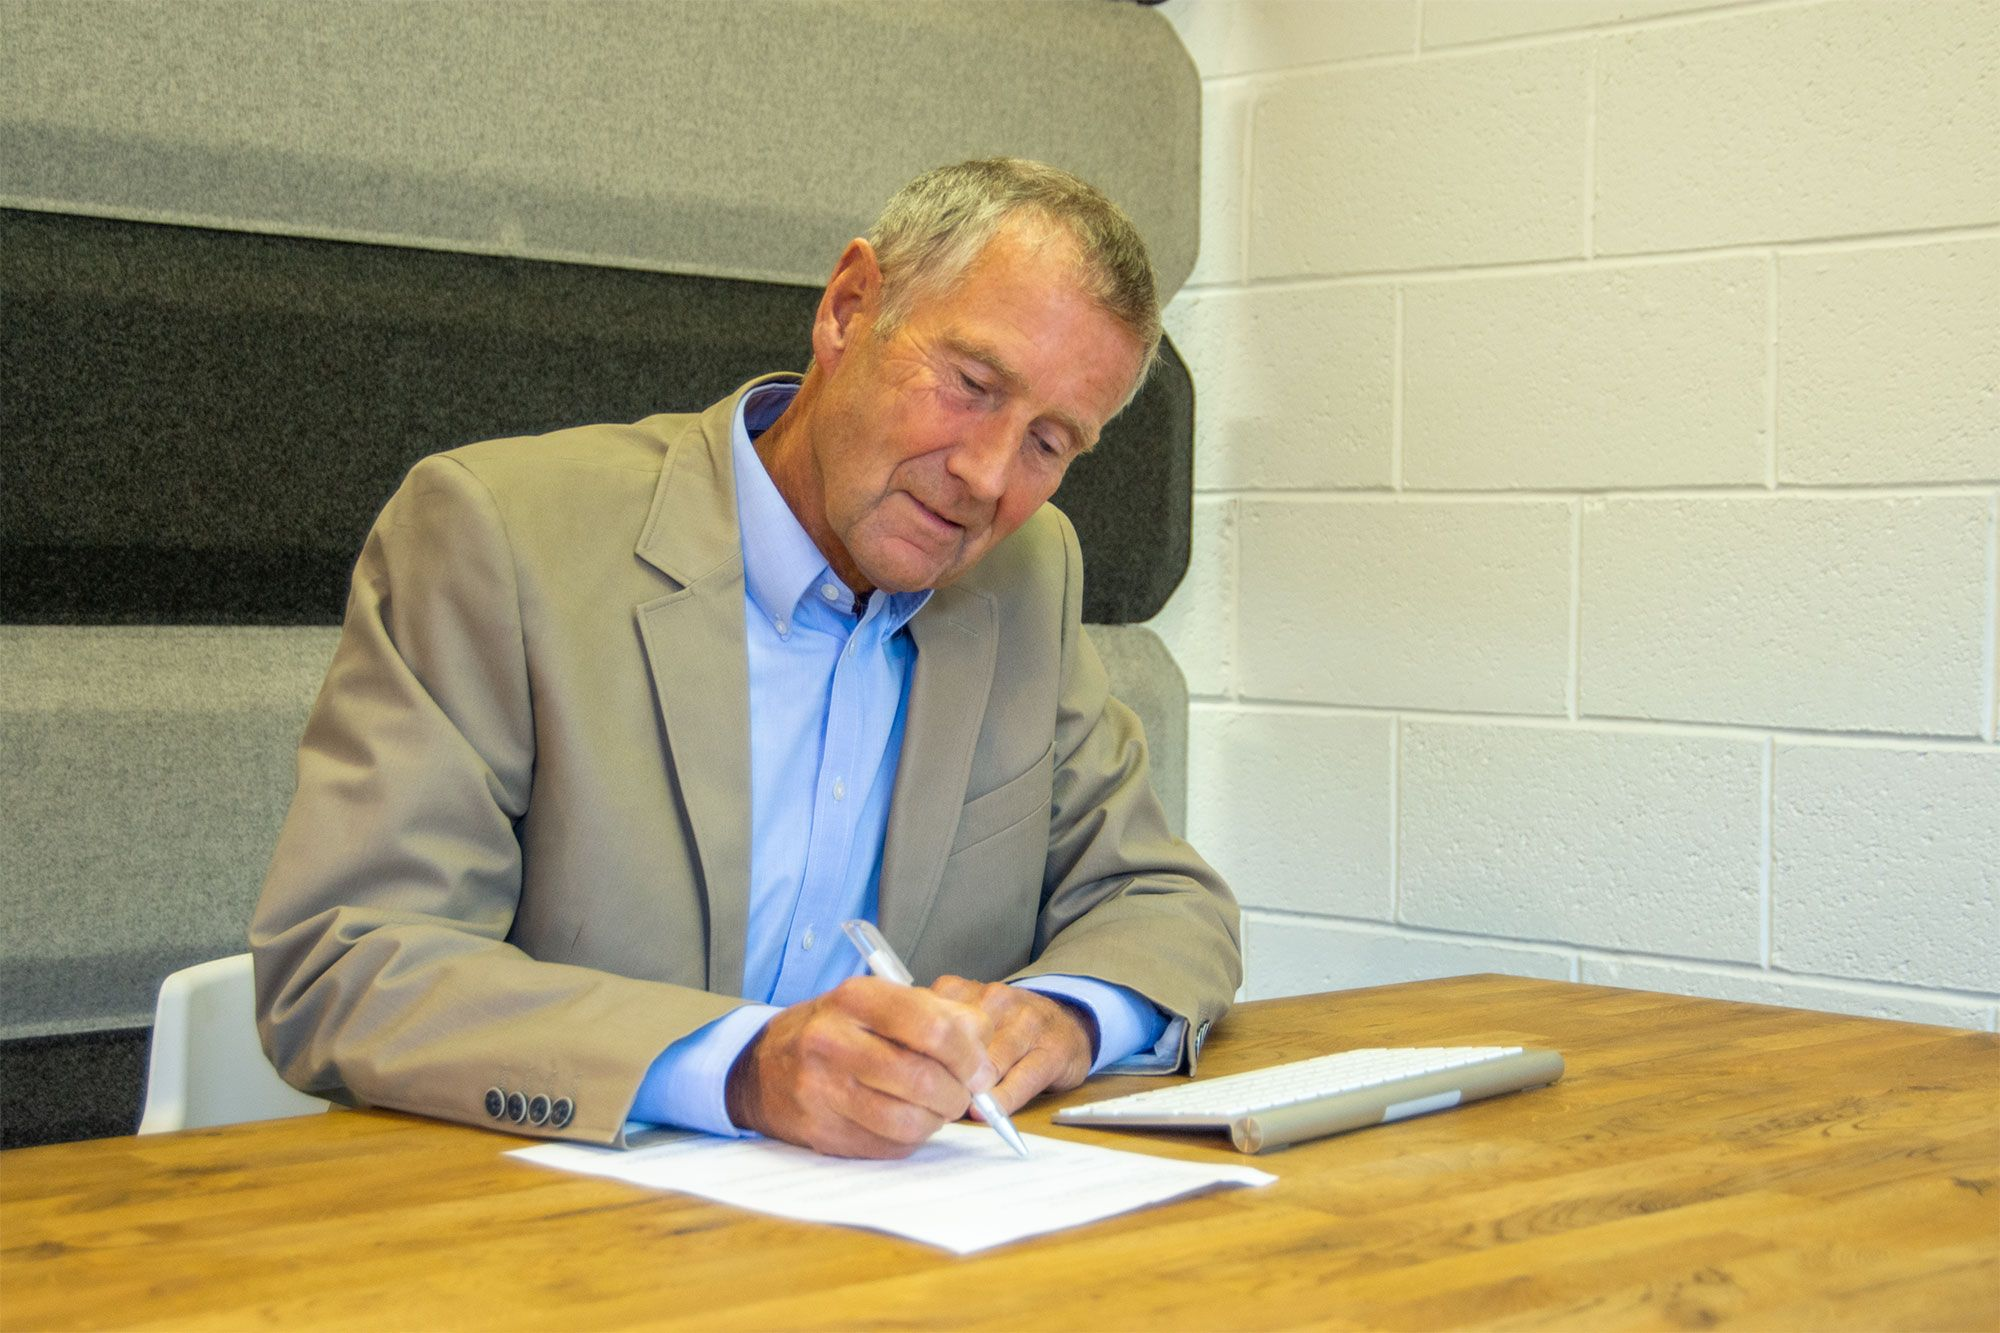 Tony Armitage, Insolvency Practitioner